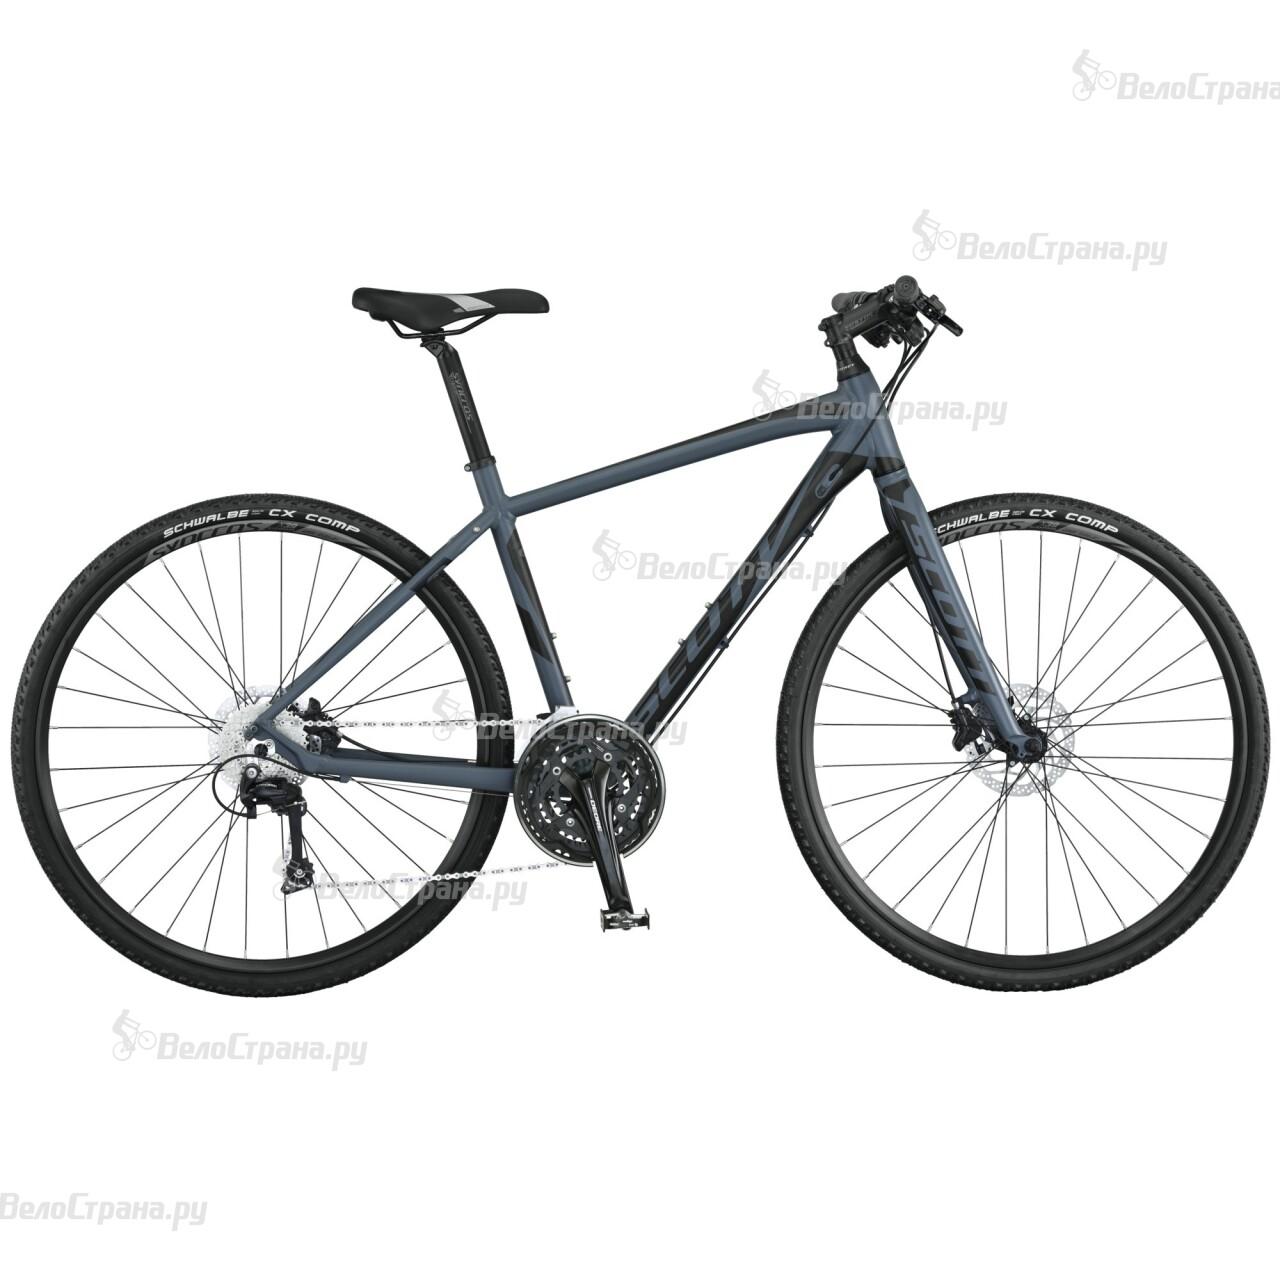 Велосипед Scott Sportster 20 Men (2015)